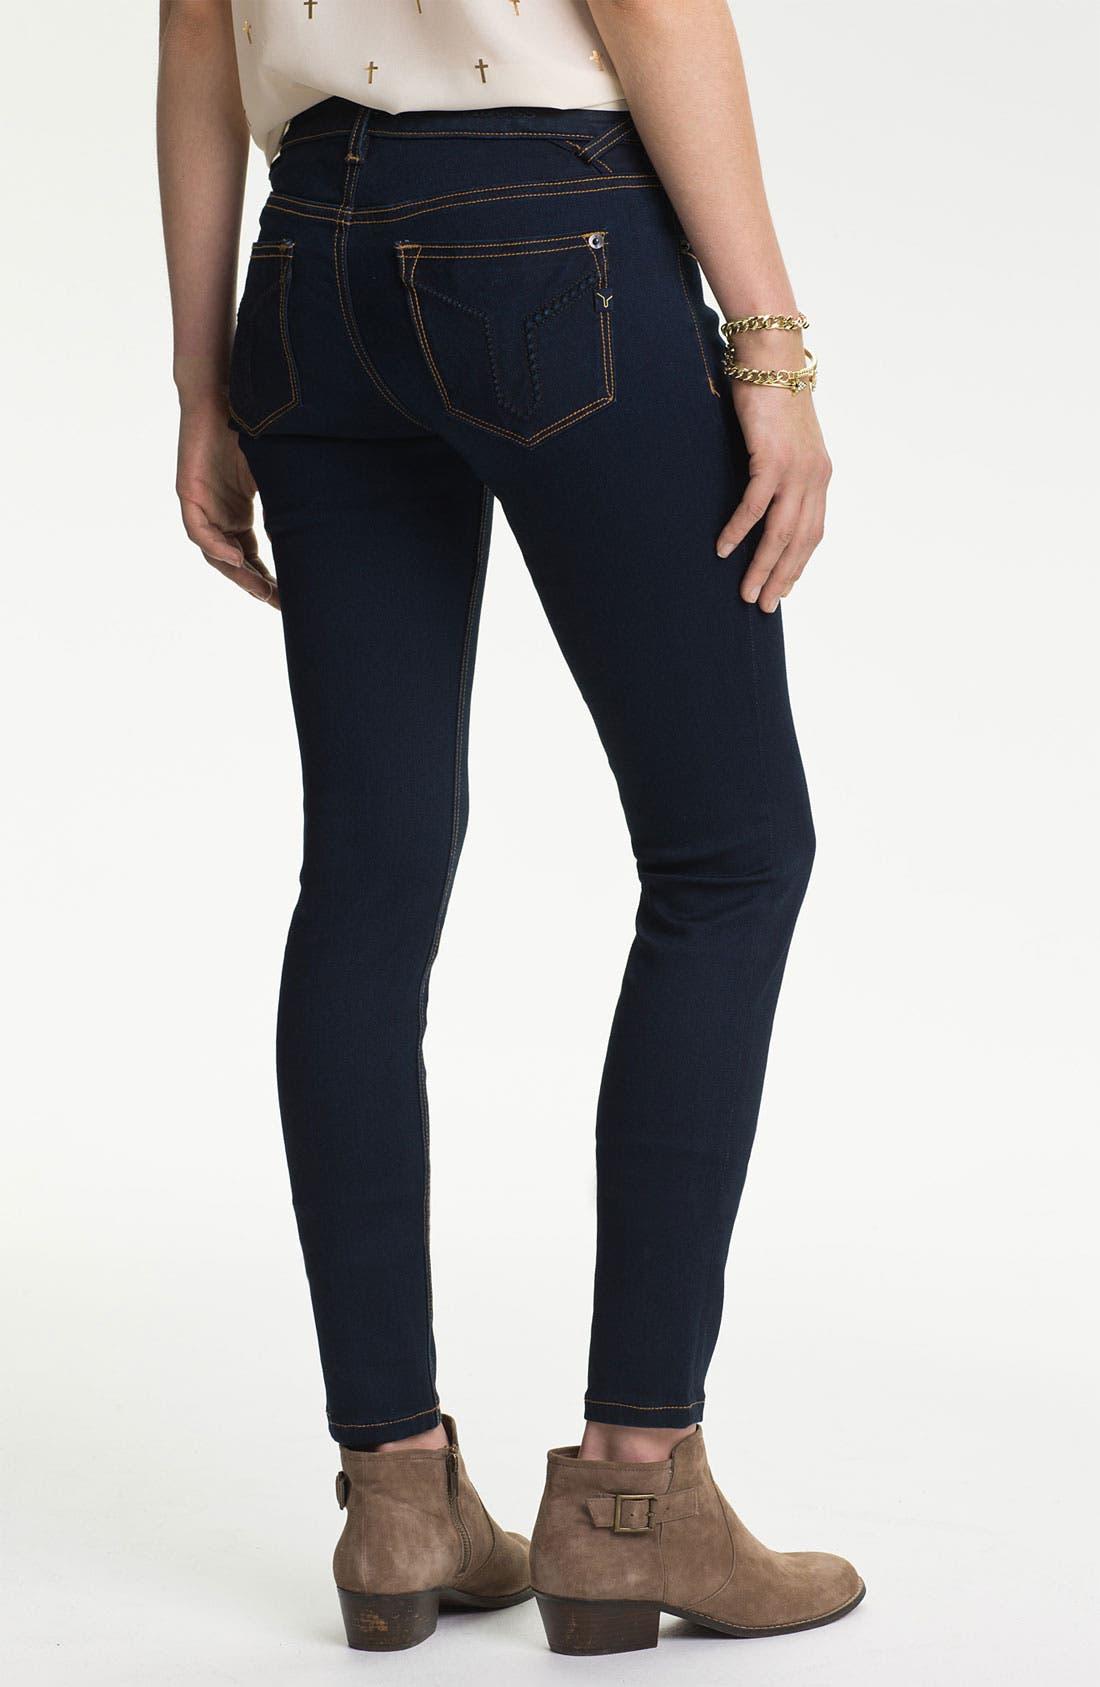 Alternate Image 1 Selected - Vigoss Embroidered Pocket Skinny Jeans (Juniors)